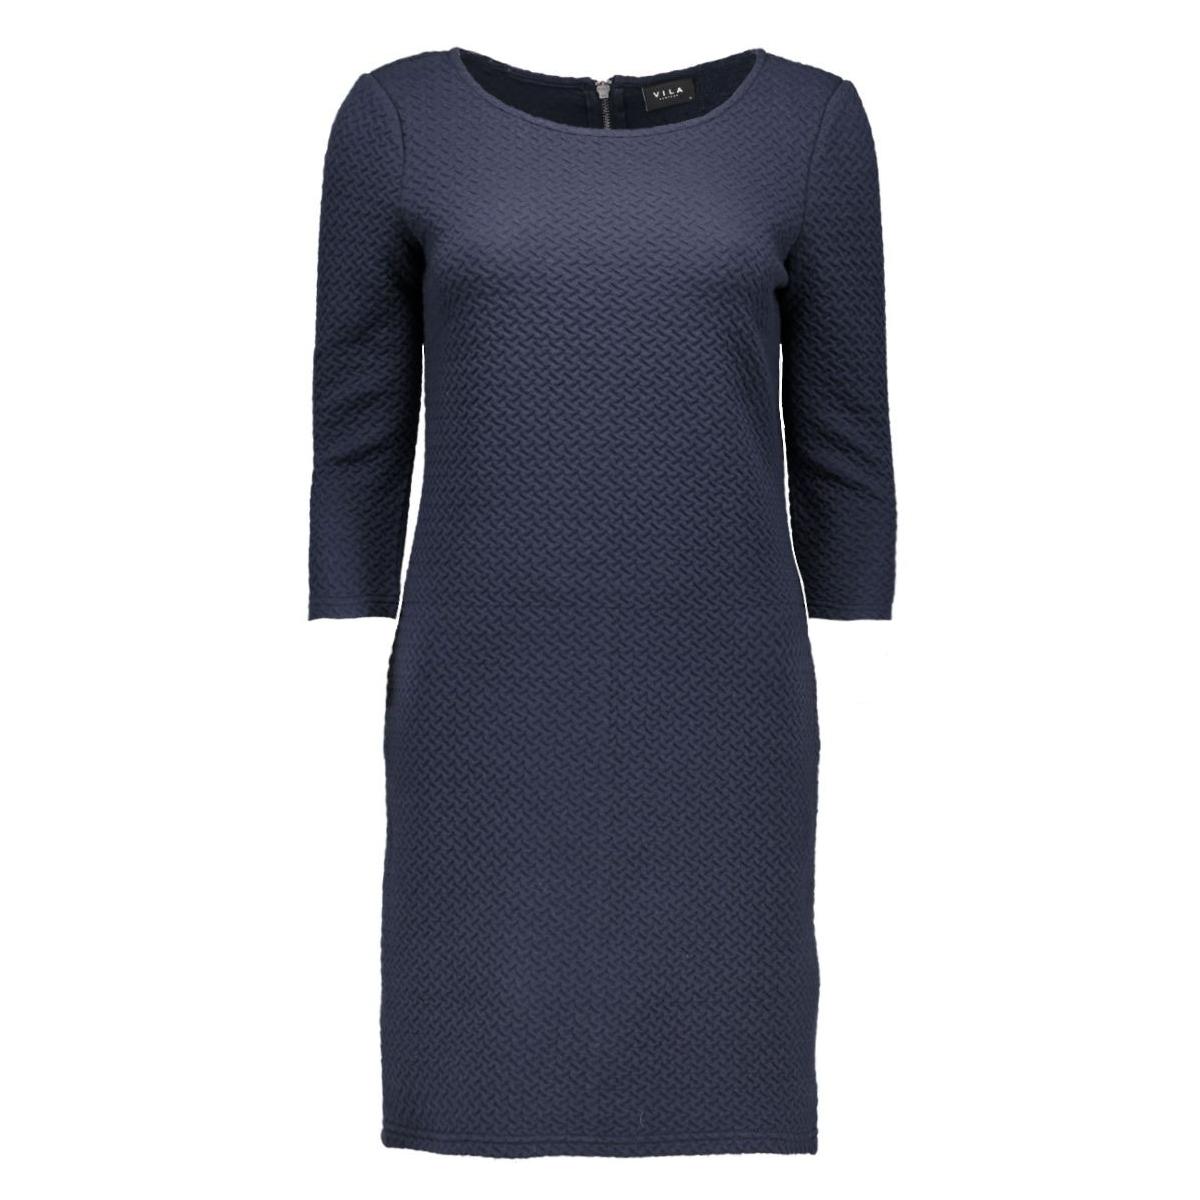 vinaja 3/4 sleeve dress-noos 14036251 vila jurk total eclipse